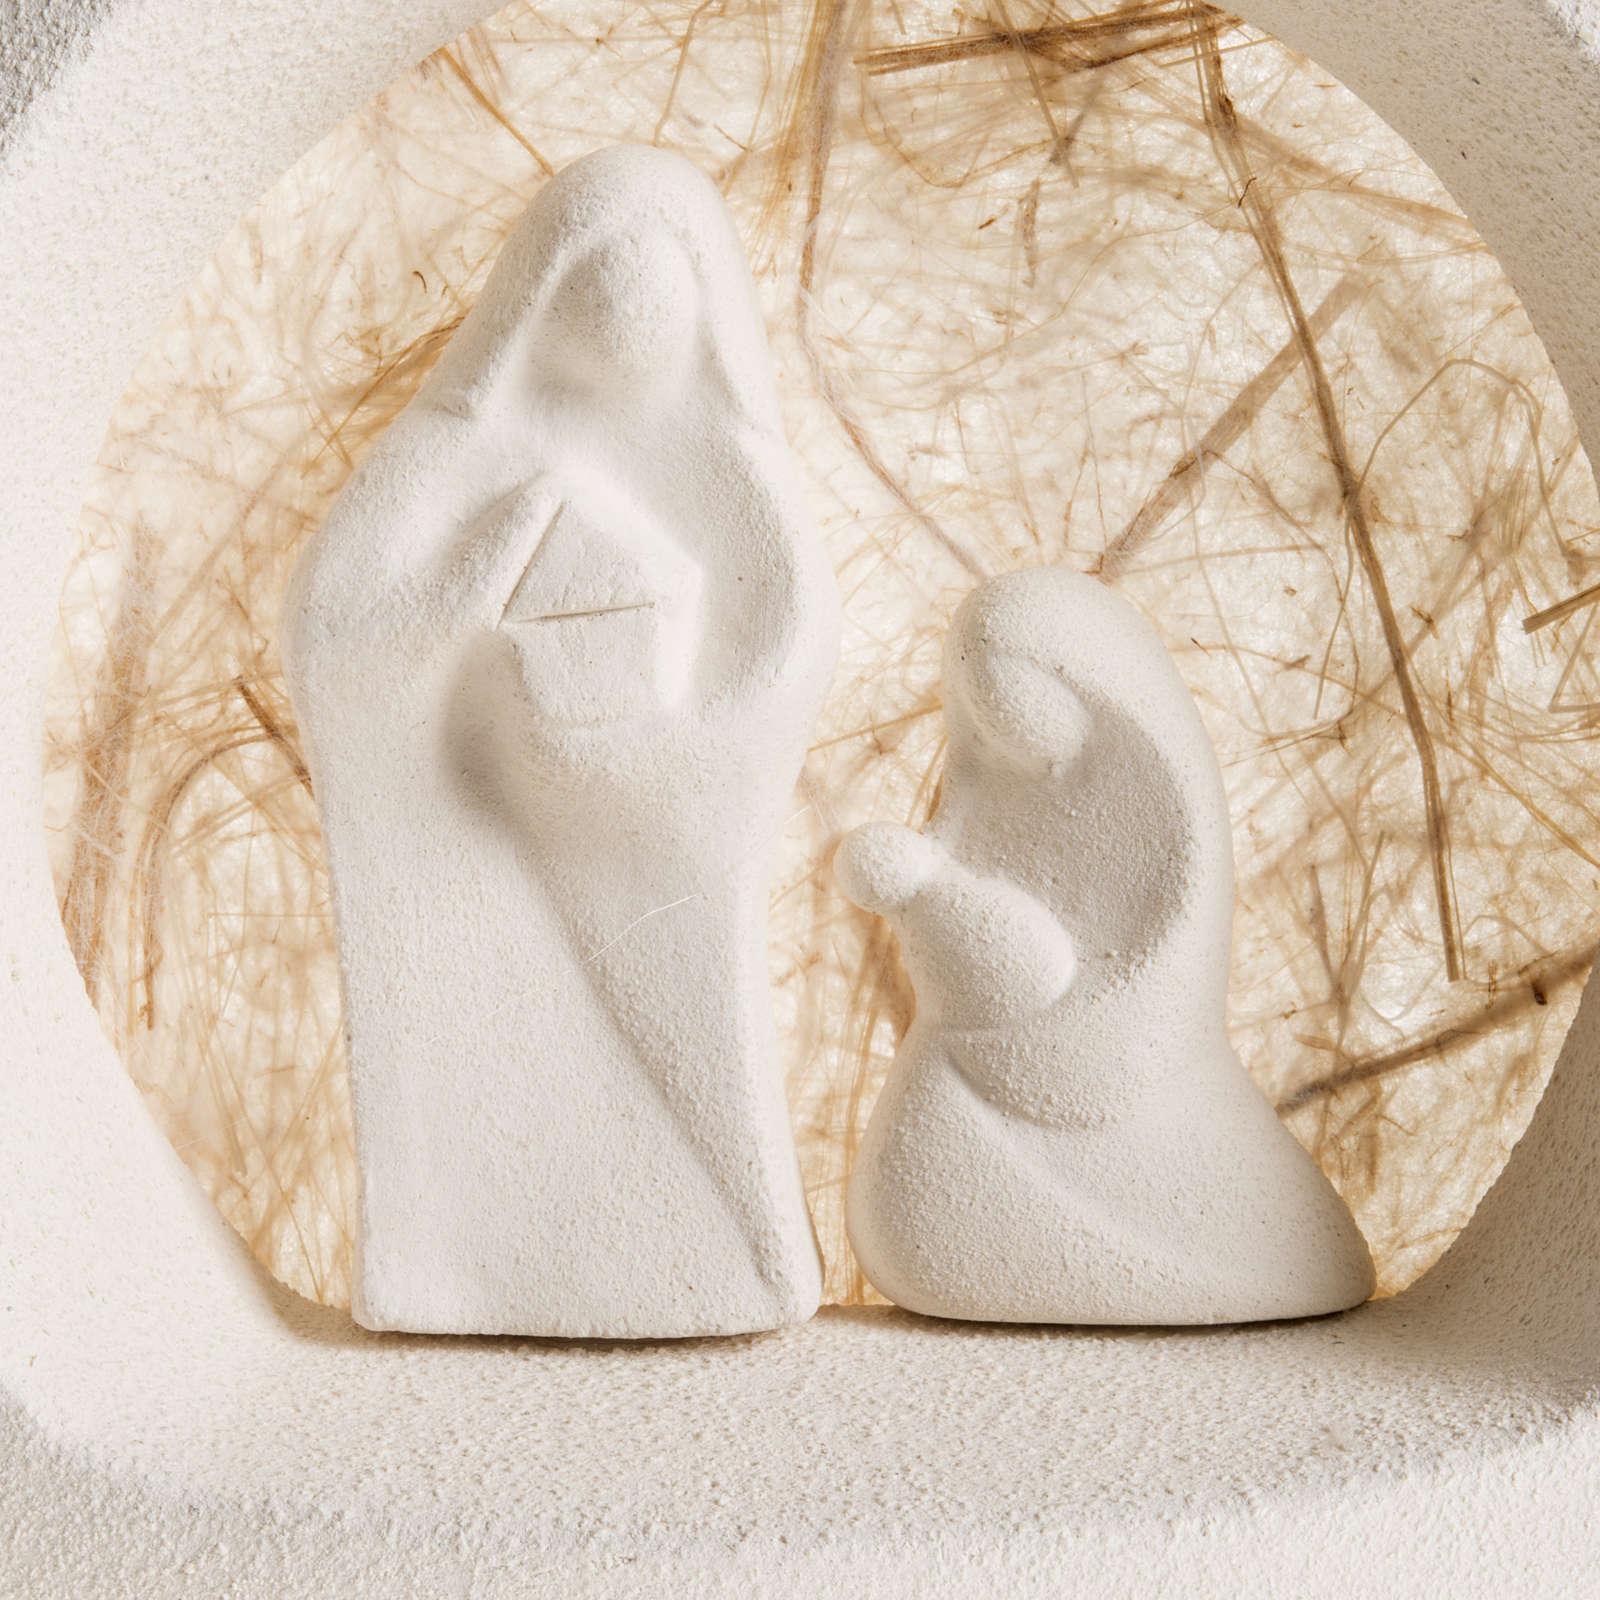 Nativity scene, tree shaped wall nativity in clay, beige 3